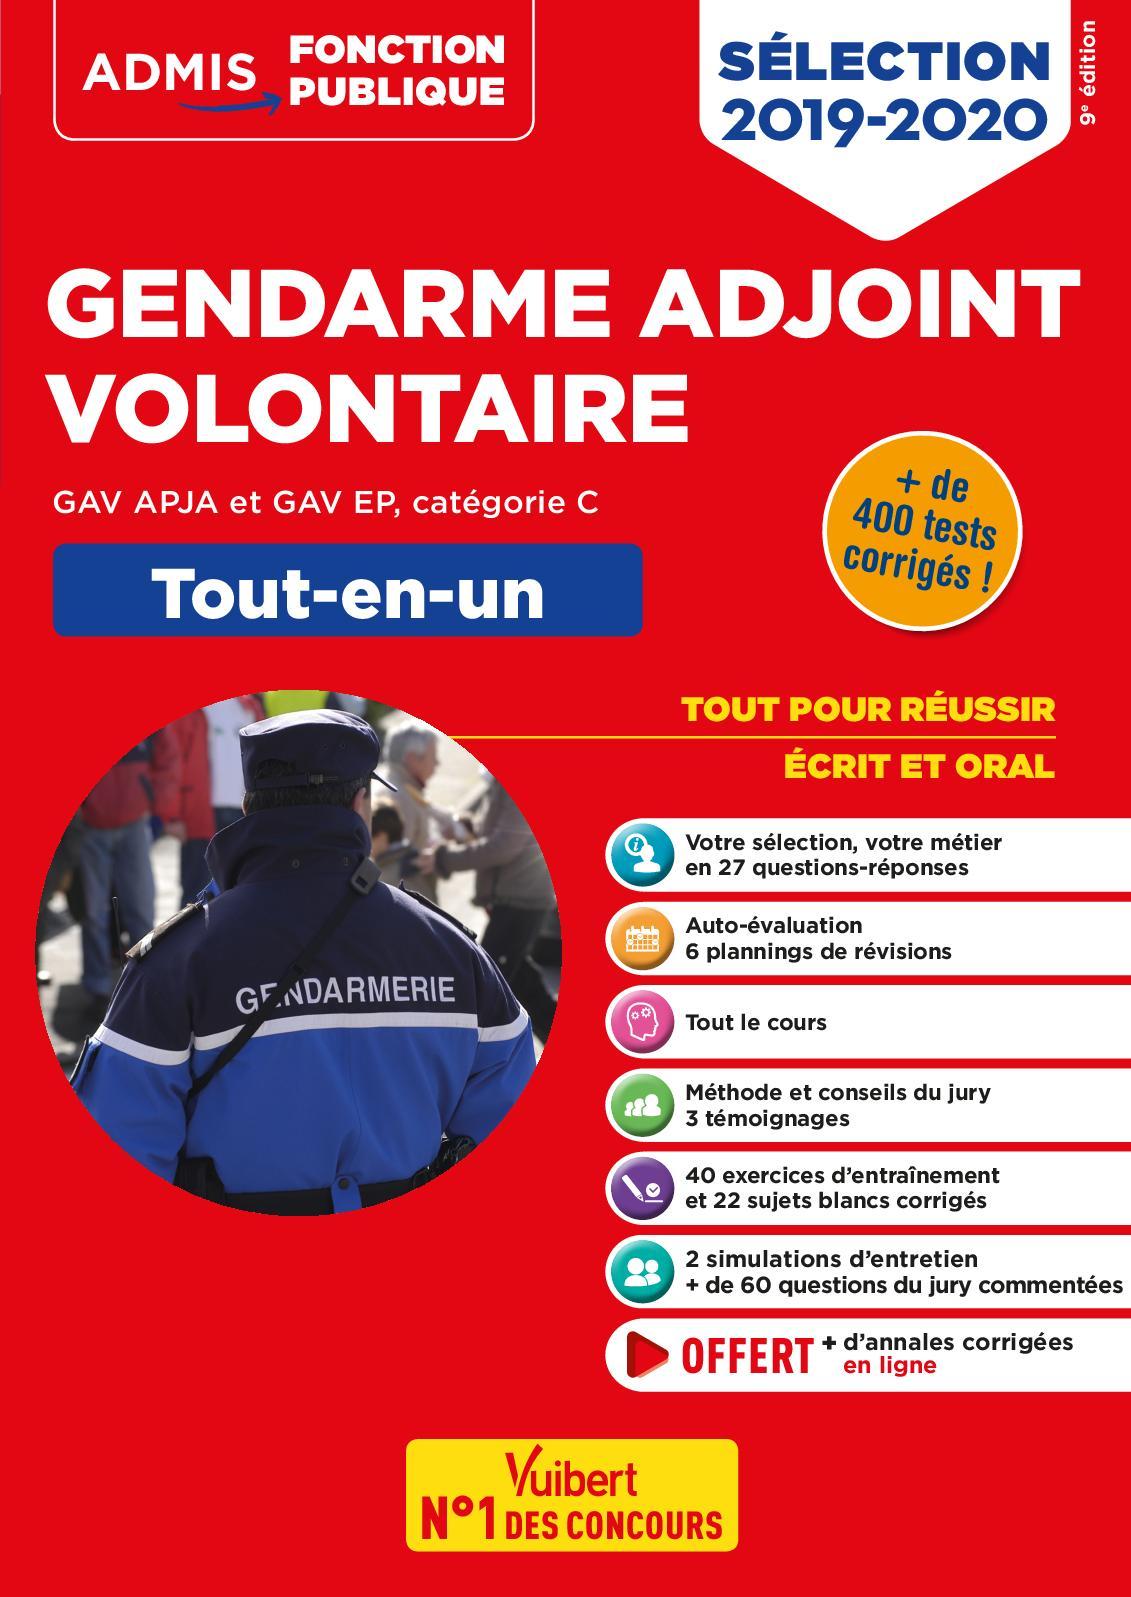 Calaméo Extrait Gendarme Adjoint Volontaire